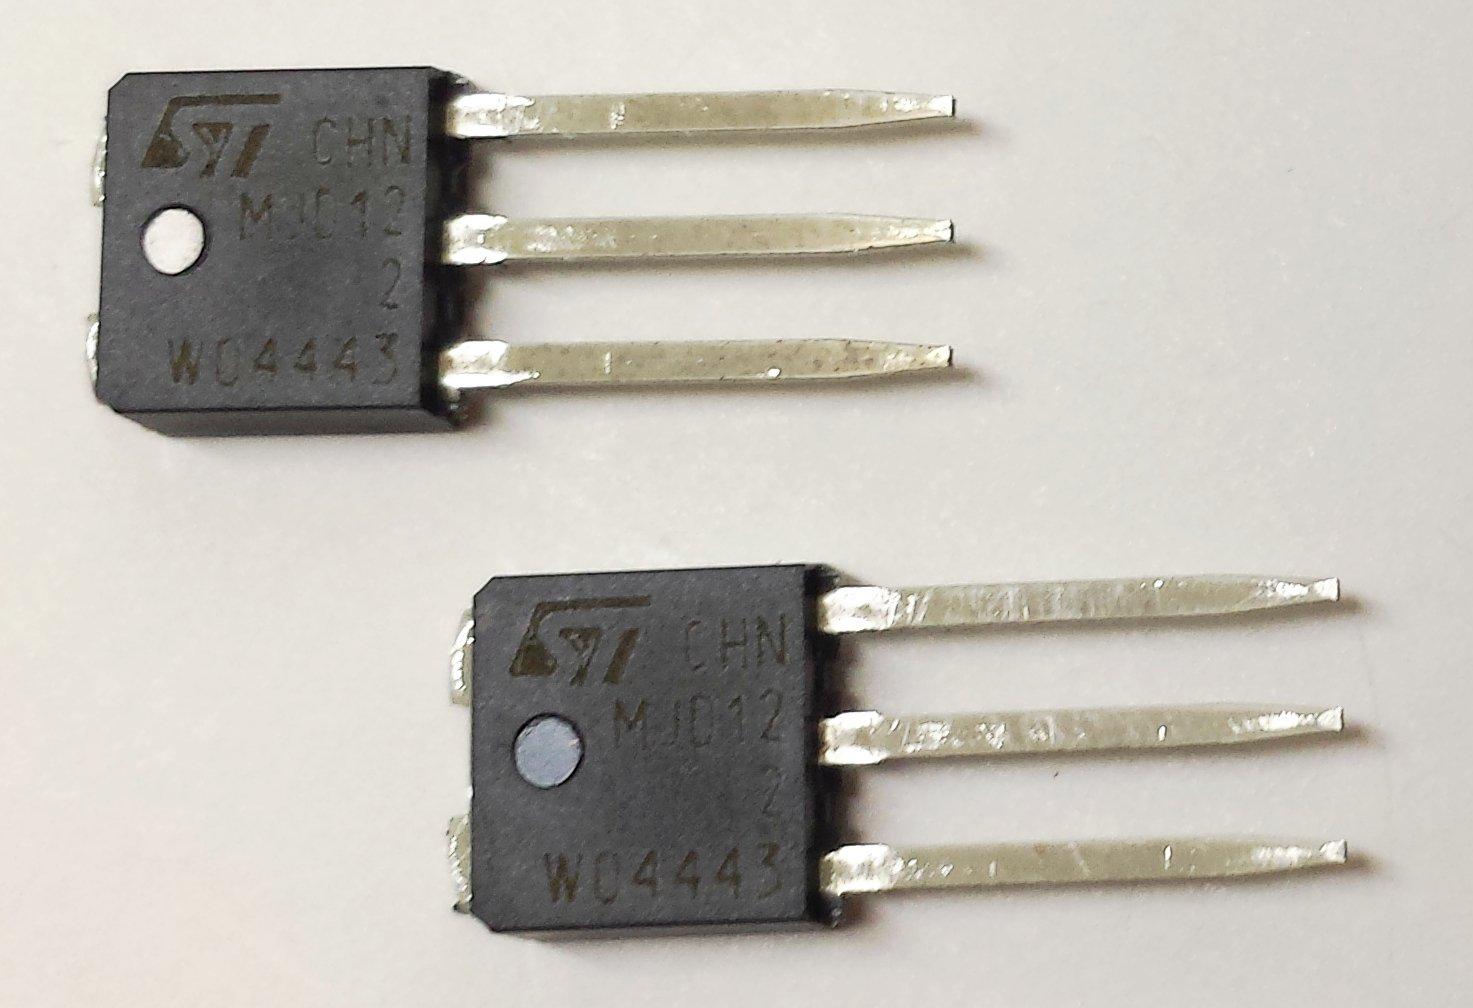 20 Stck Mjd122 1 Npn Power Darlington Transistor Vcbo 100v Vceo Circuit Diagram Of A Pair Using Transistors 5a Ptot 20w To 251 Ipak Gehuse Gewerbe